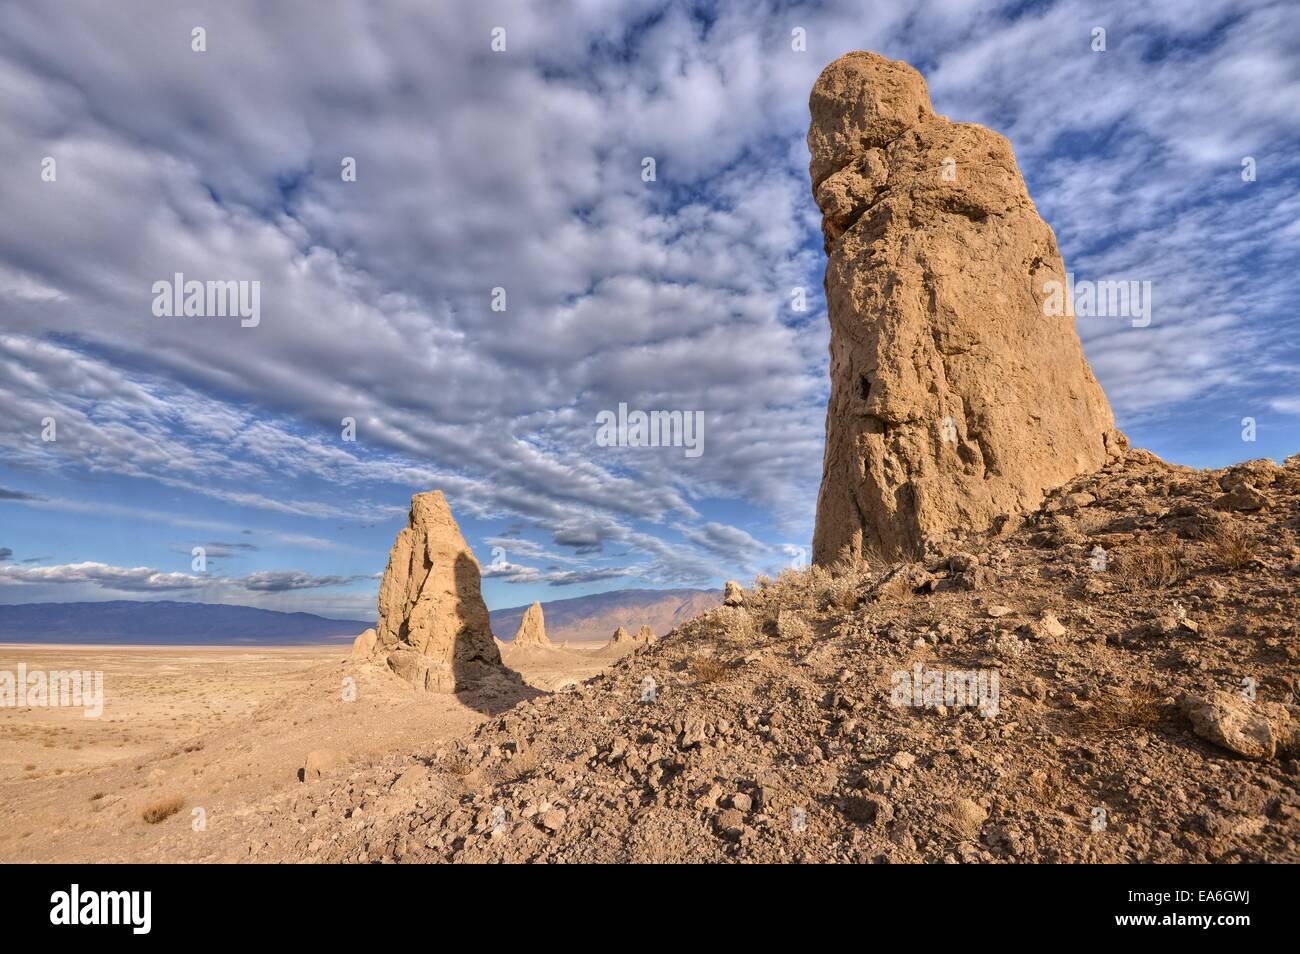 USA, California, Mojave desert, Trona Pinnacles National Natural Landmark - Stock Image